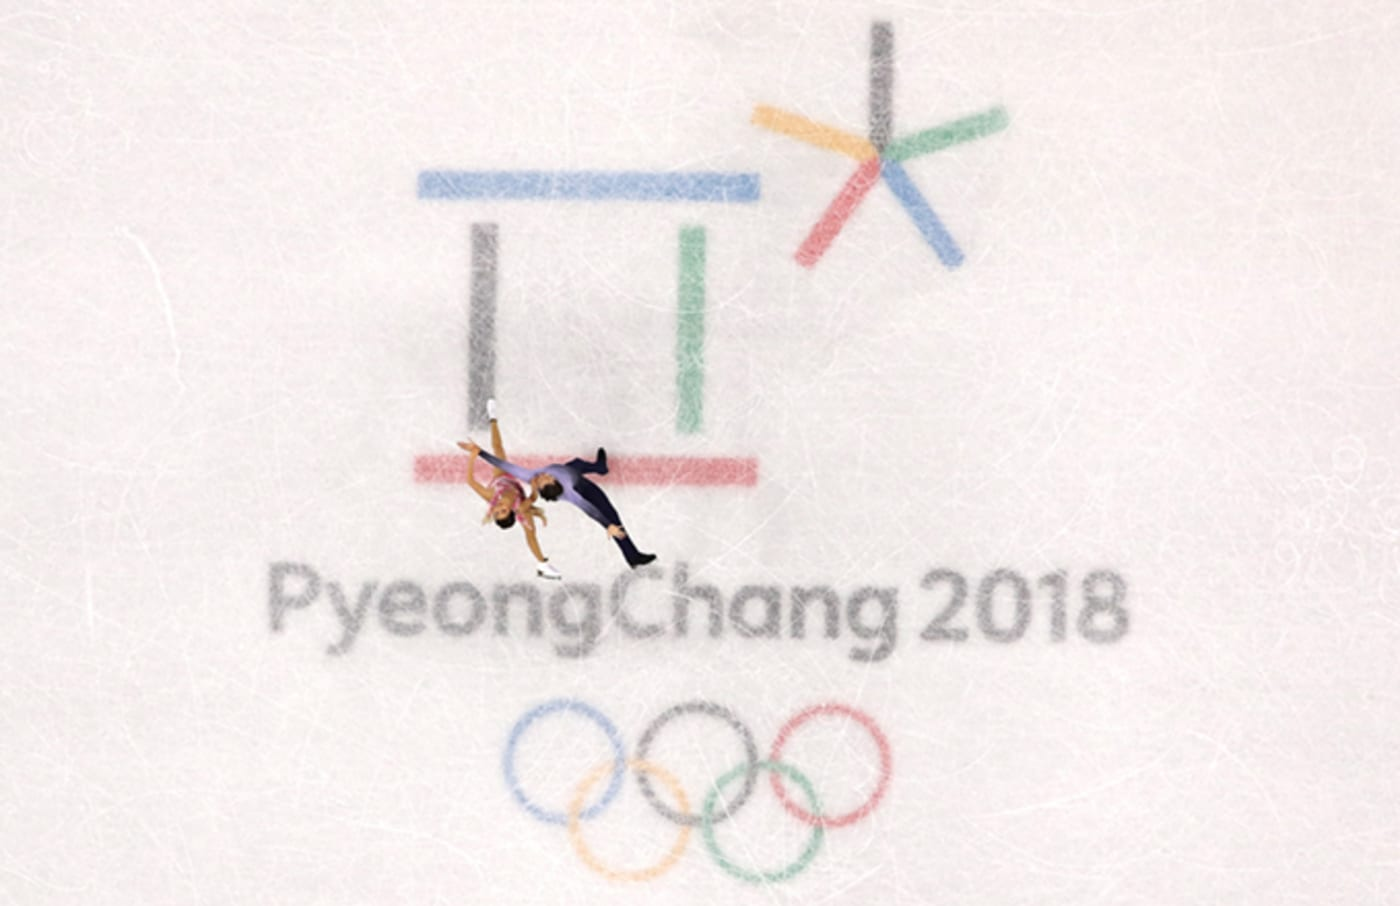 winter olympics 2018 getty feb 11